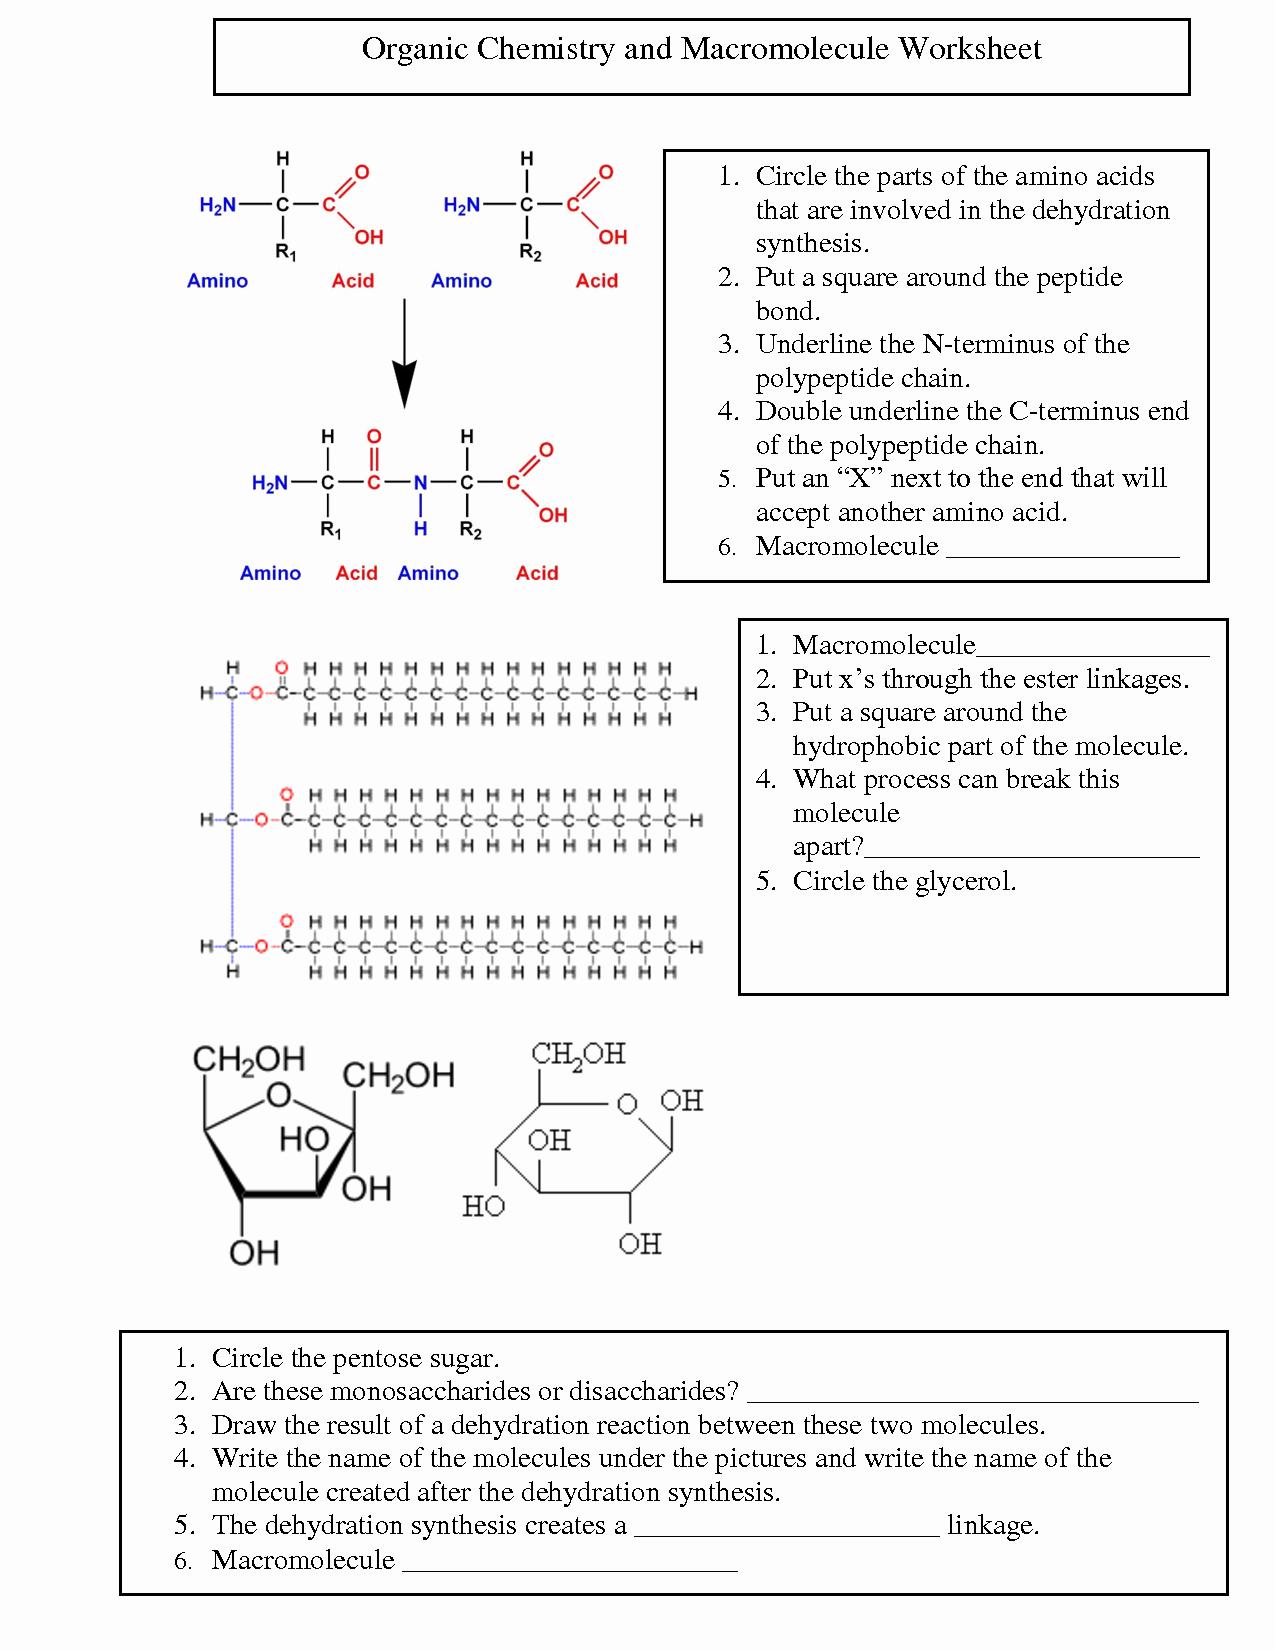 50 Biological Molecules Worksheet Answers